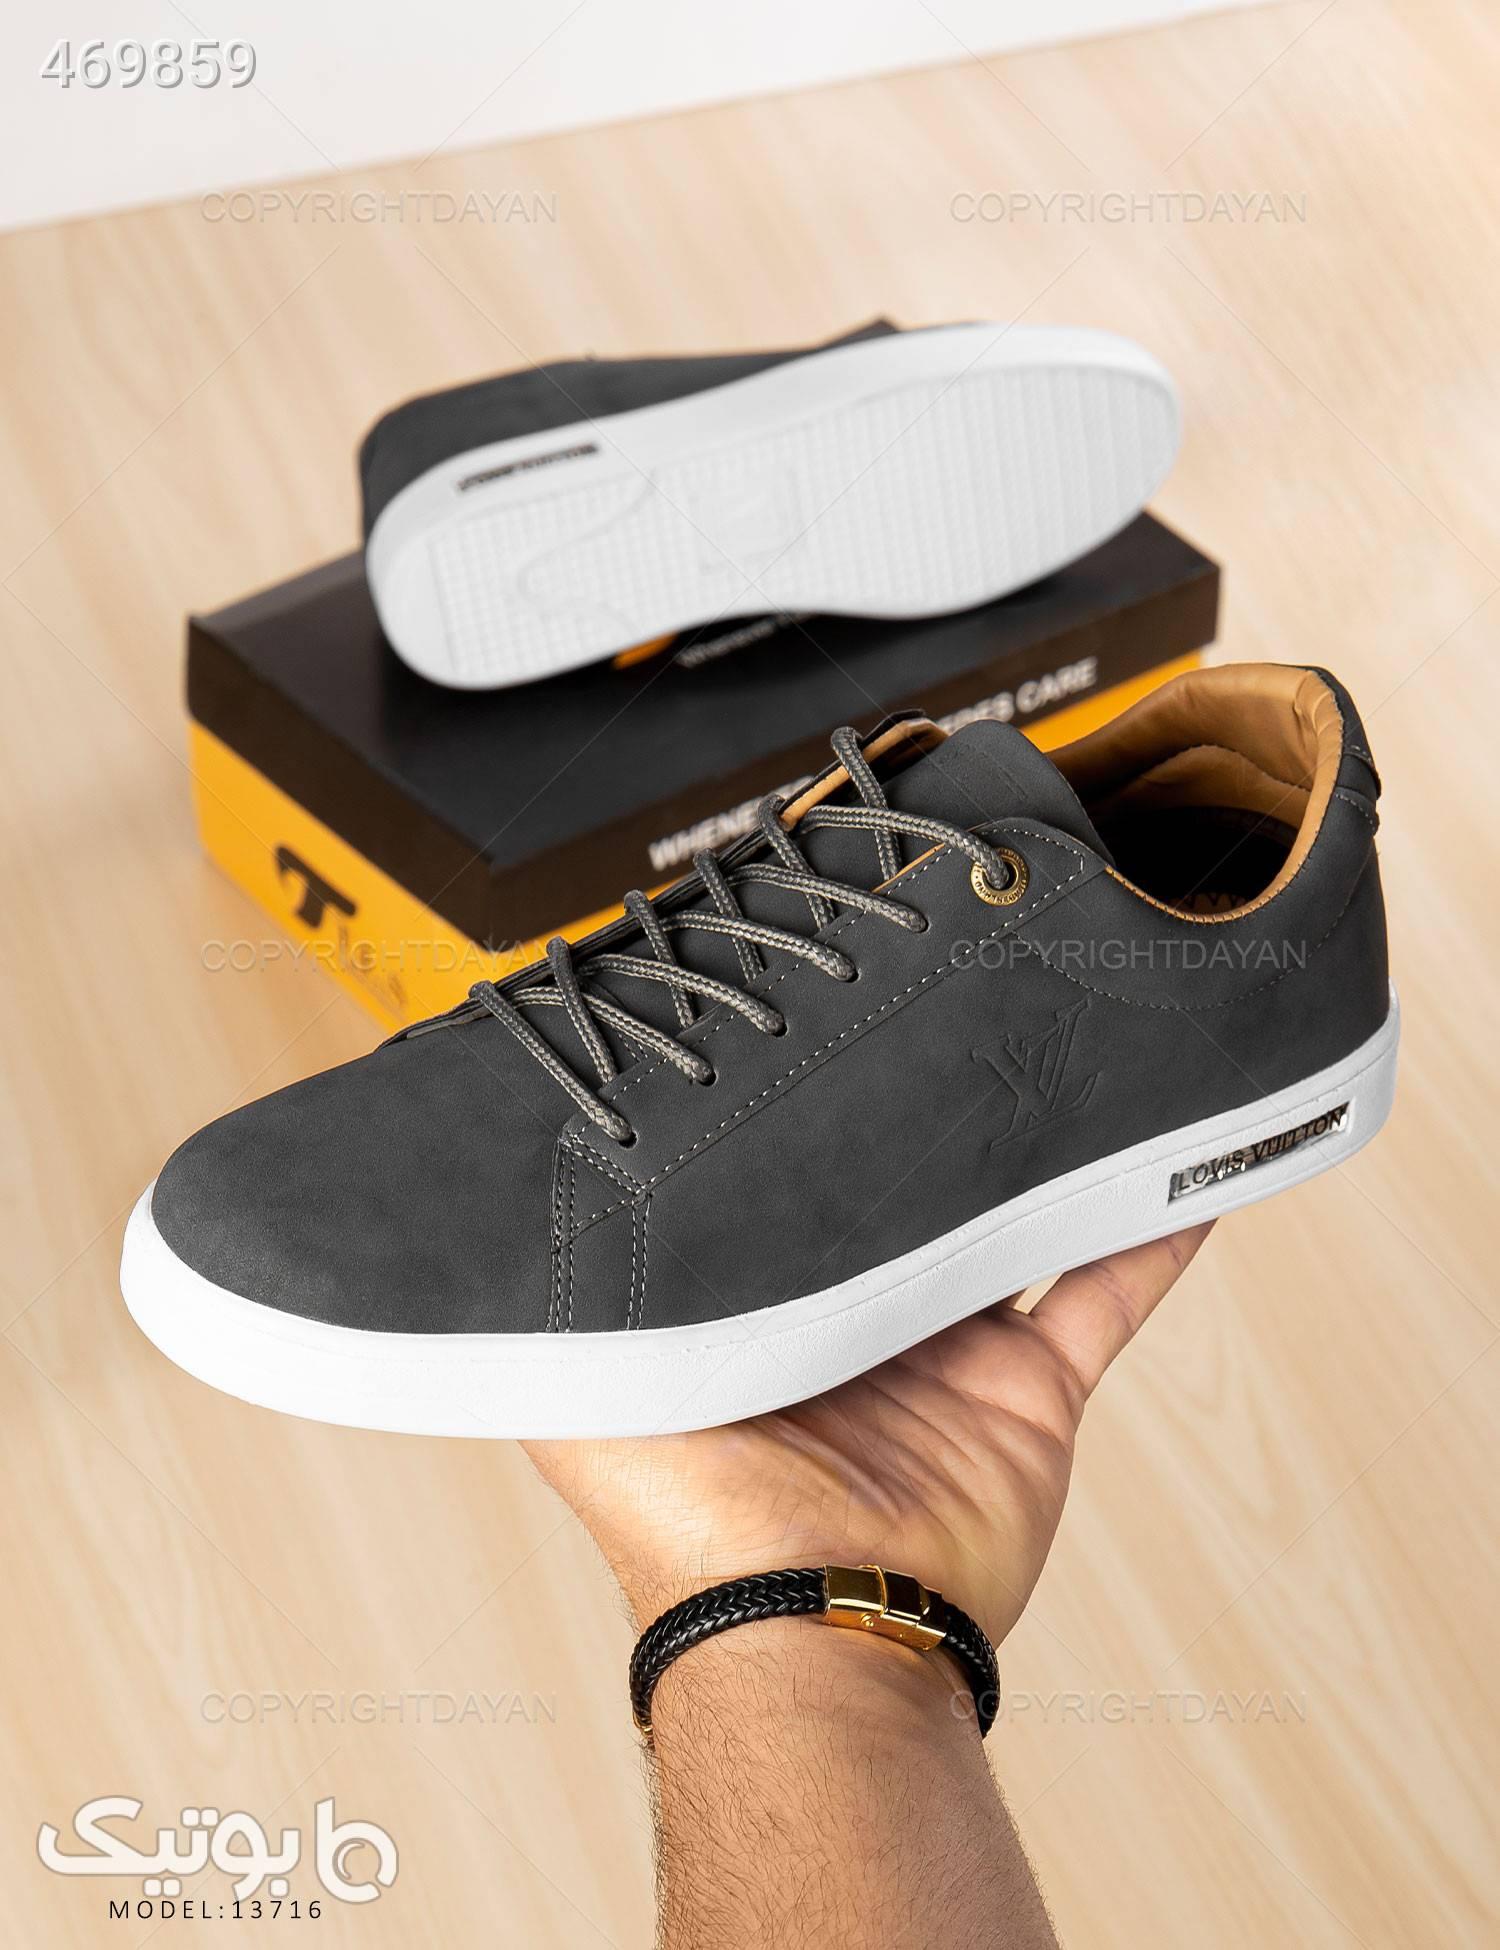 کفش روزمره مردانه Louis Vuitton مدل 13716 طوسی كفش مردانه